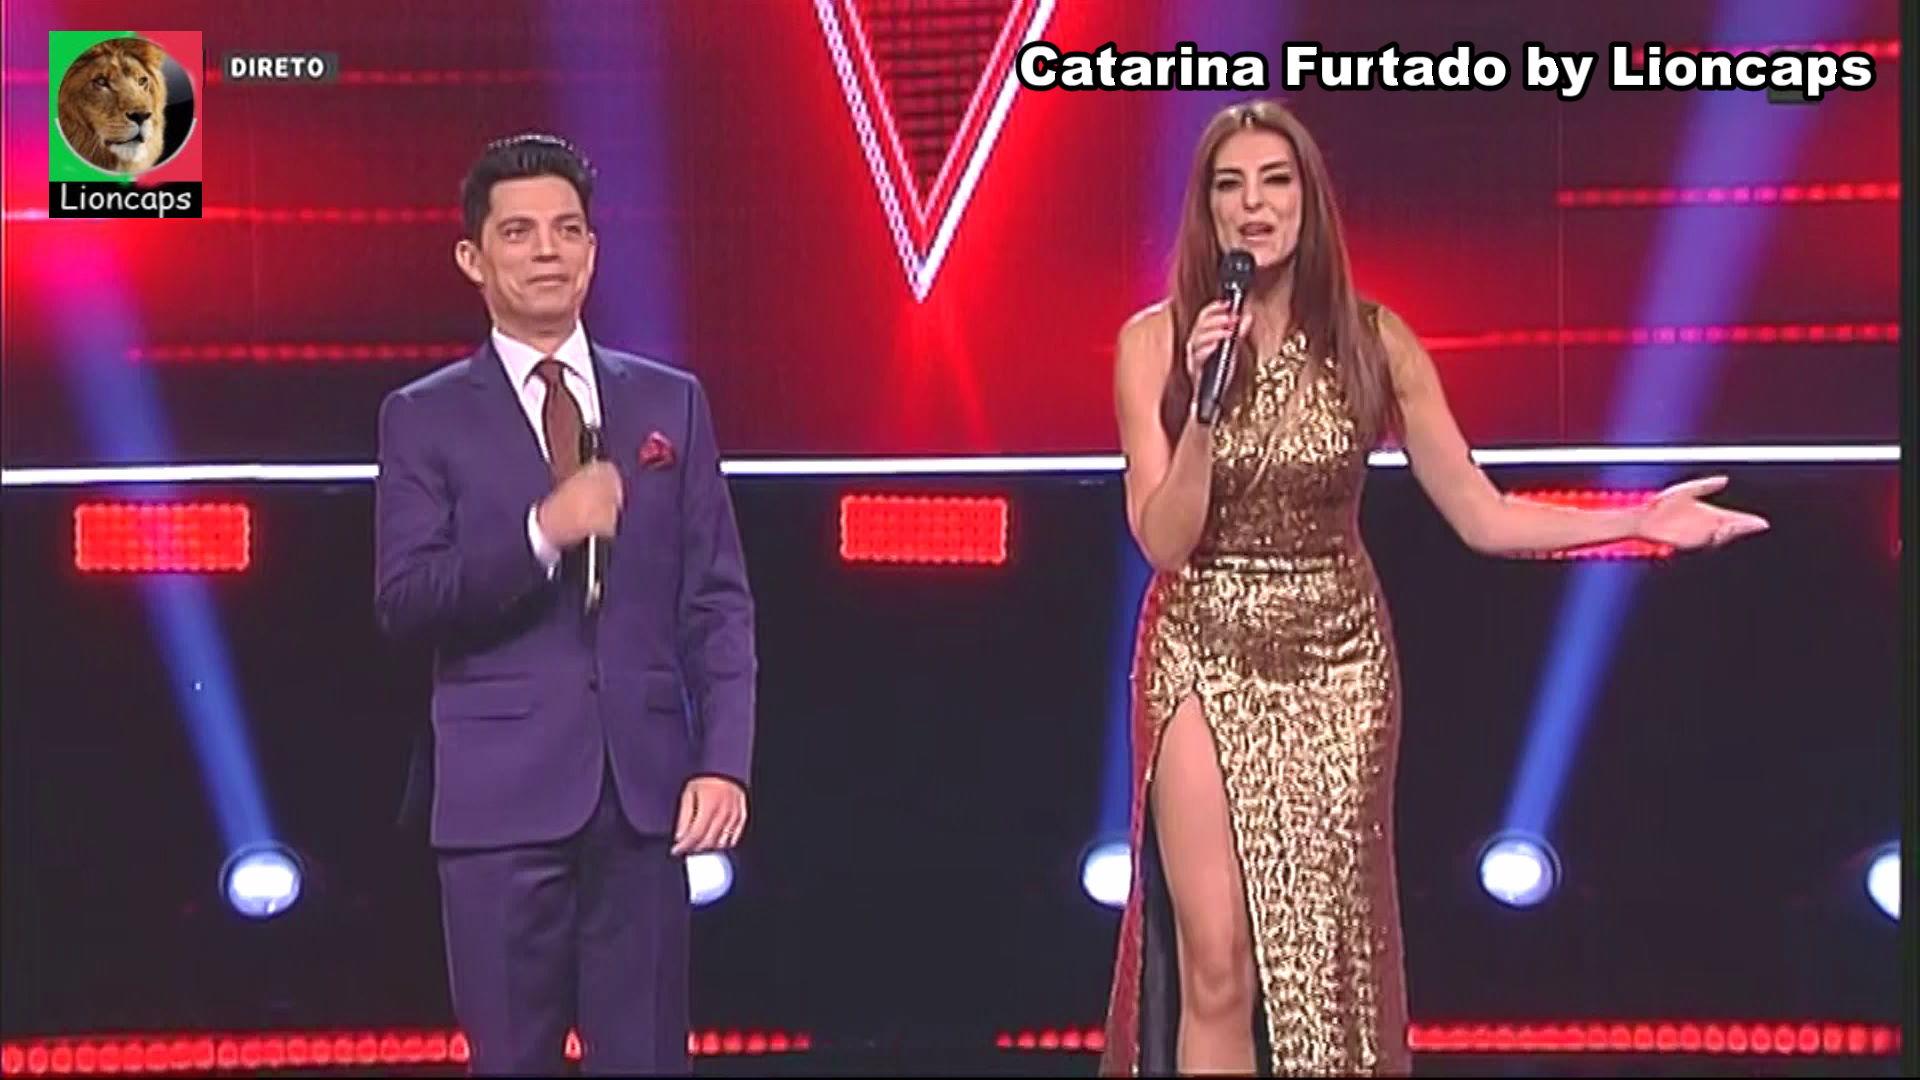 429881492_catarina_furtado_vs190324_0566_122_256lo.JPG